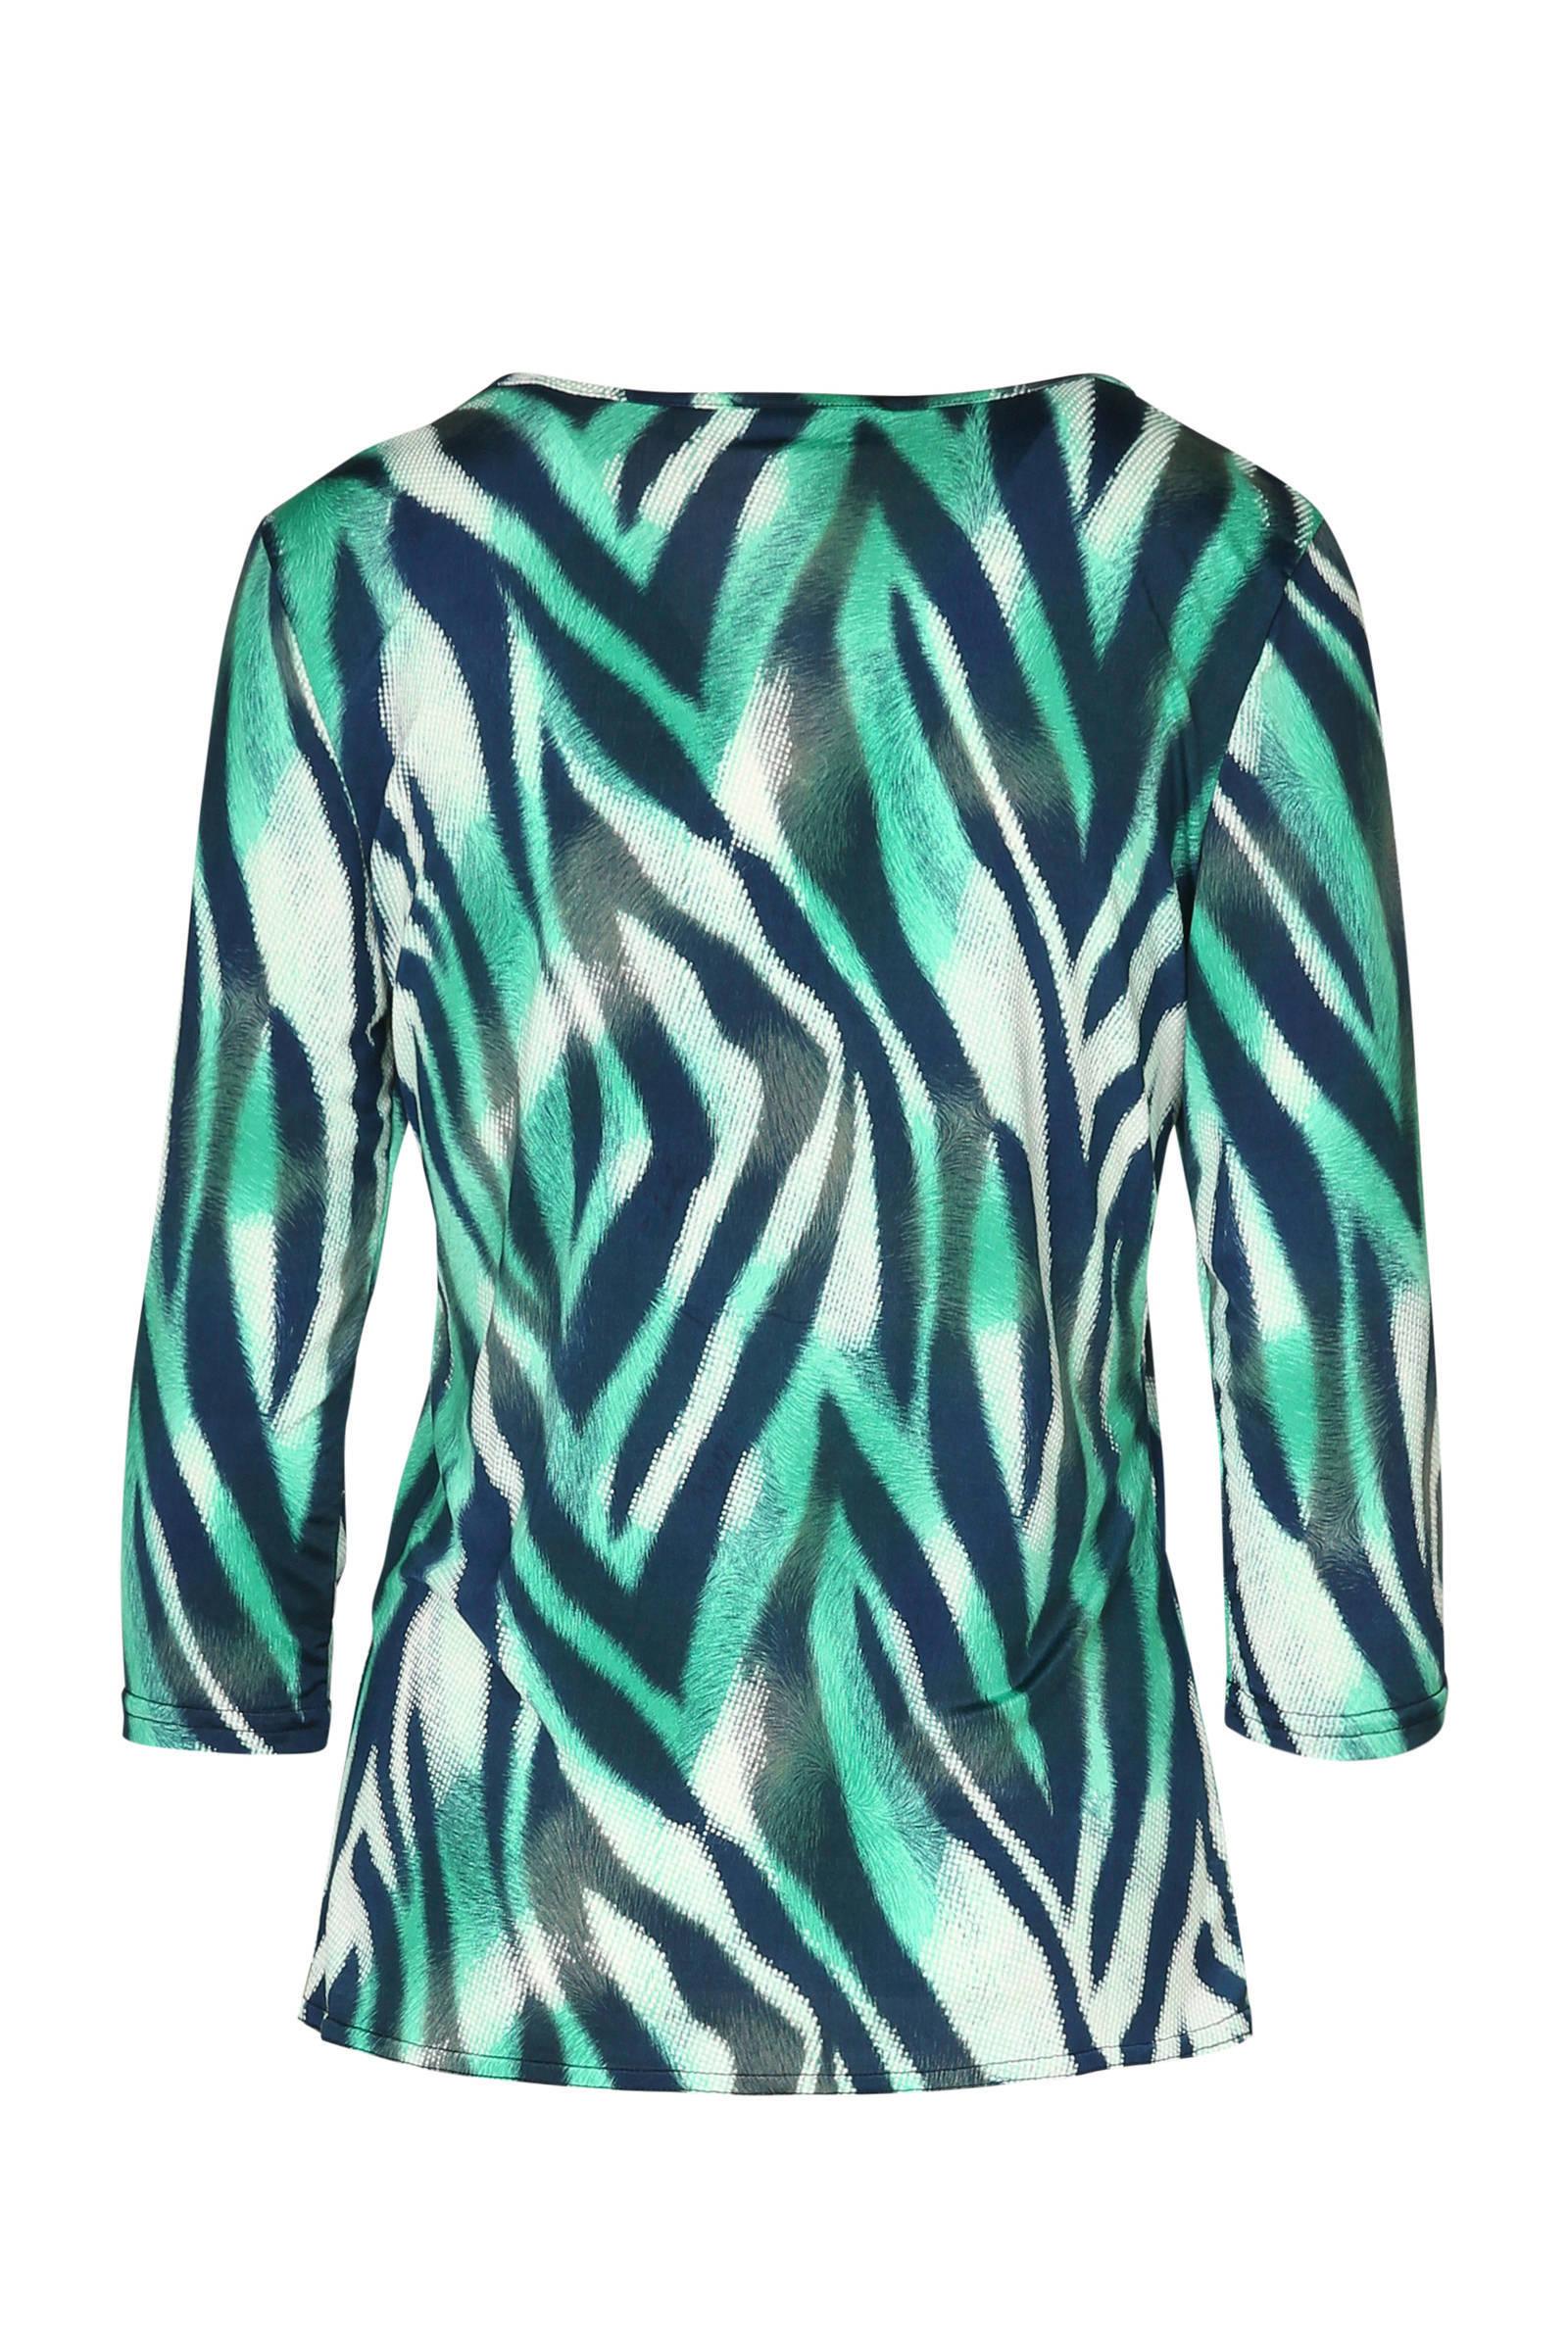 met blouse blouse Cassis zebraprint met groen Cassis zebraprint XqnS6